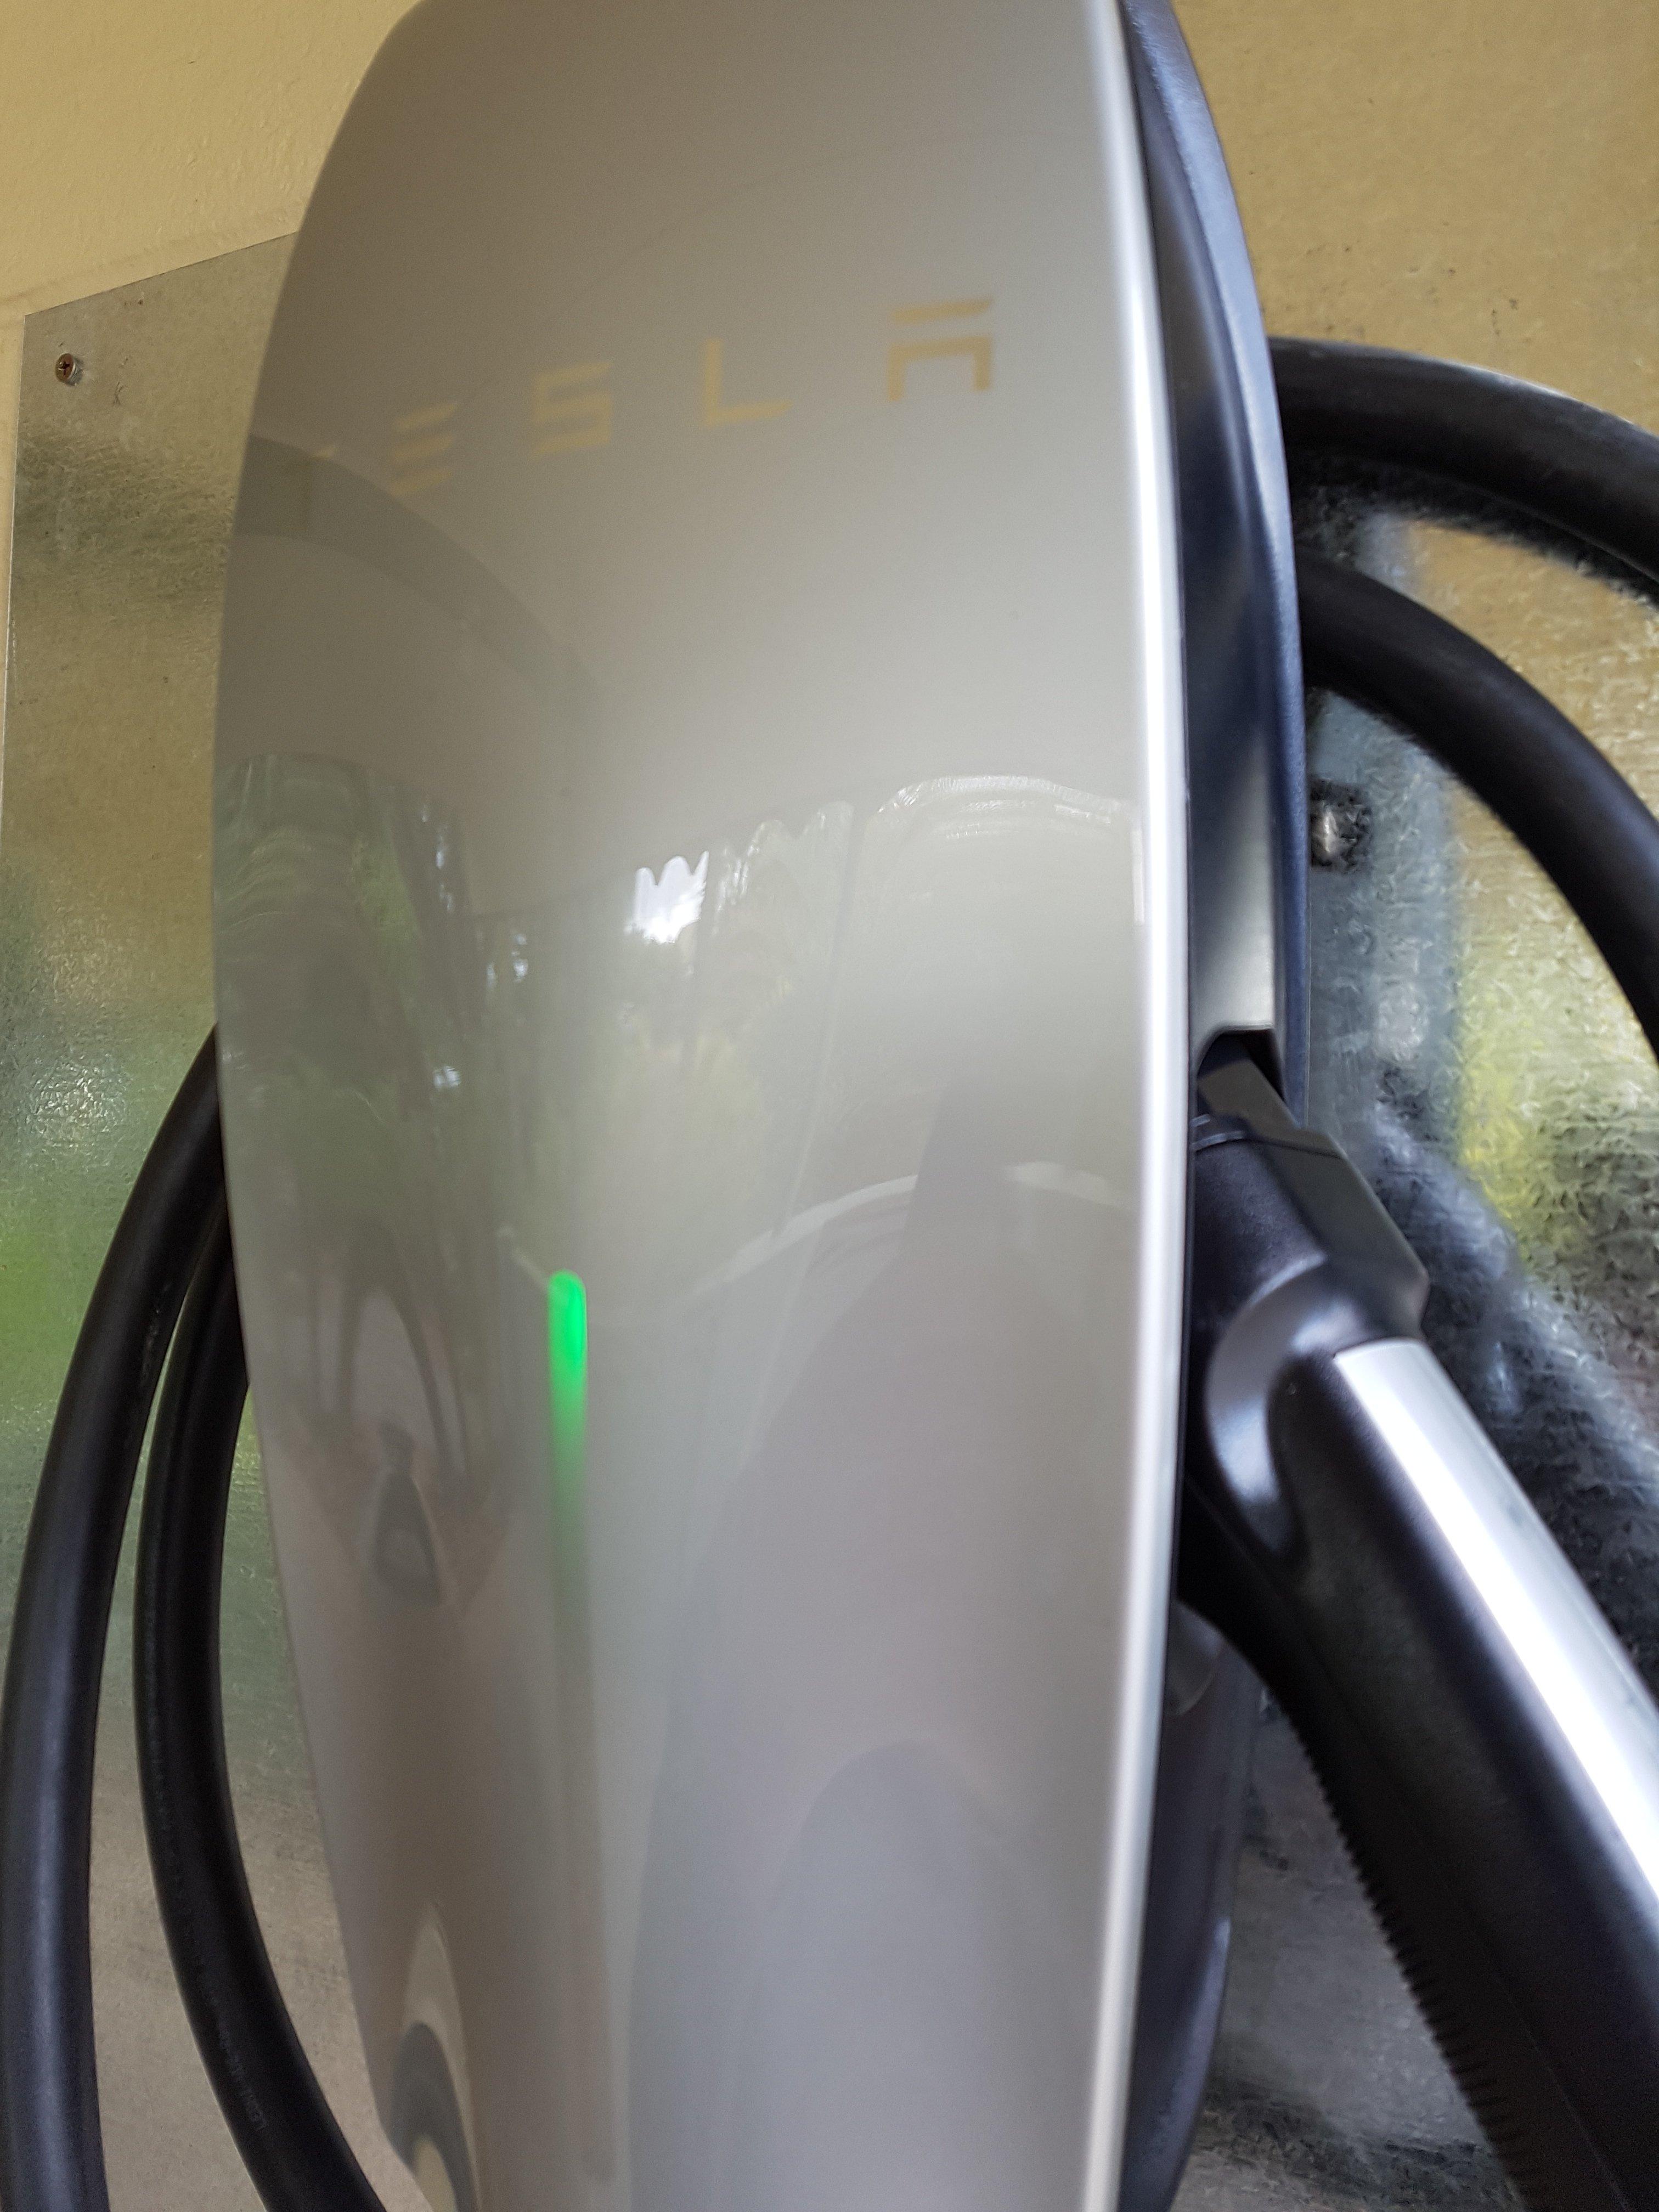 Tumby Bay Tesla destination charging